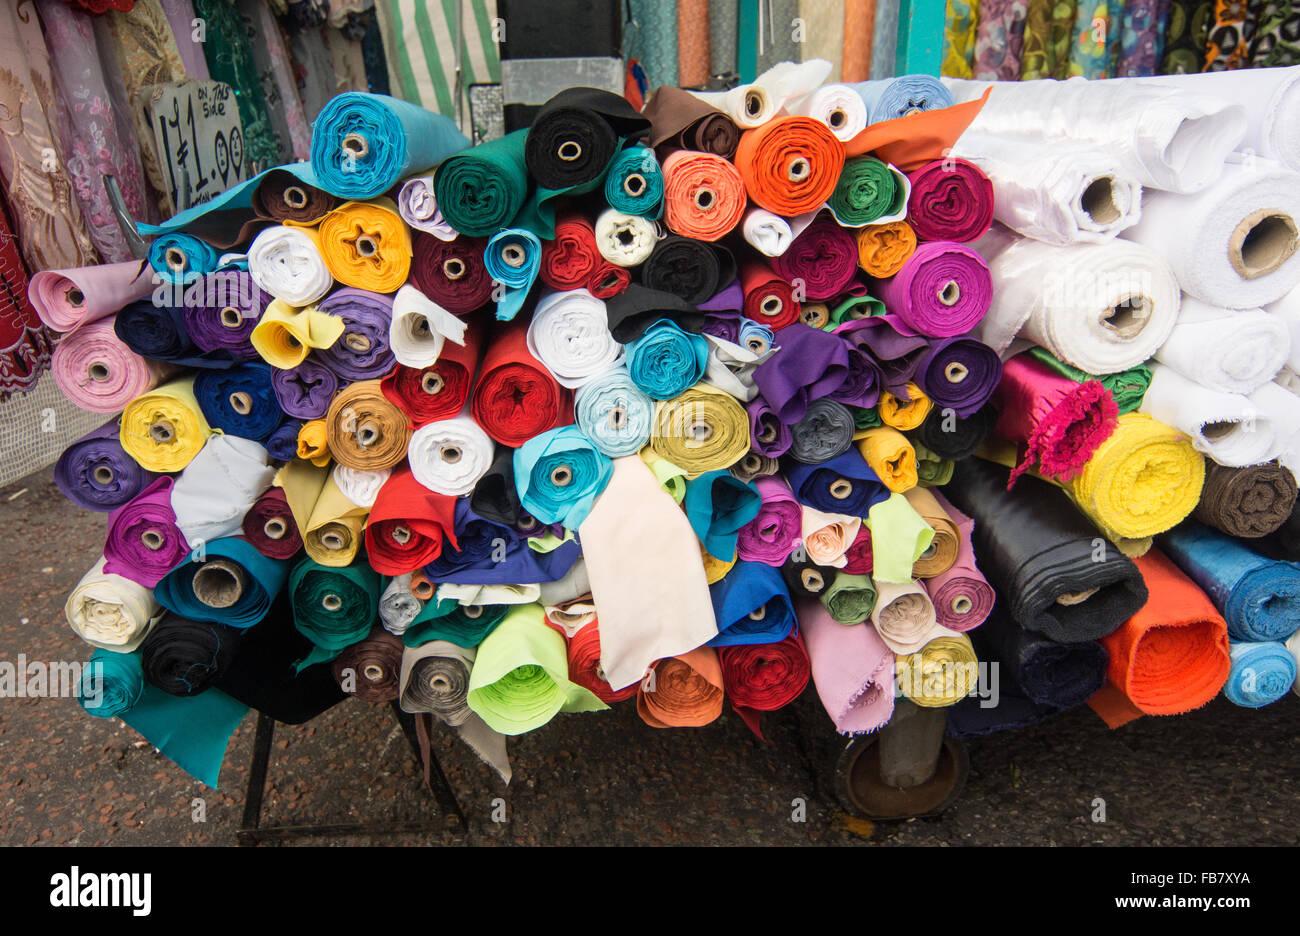 Rollen des Materials.   Tuch rollt.  Farben.  farbiges Material. Stockbild